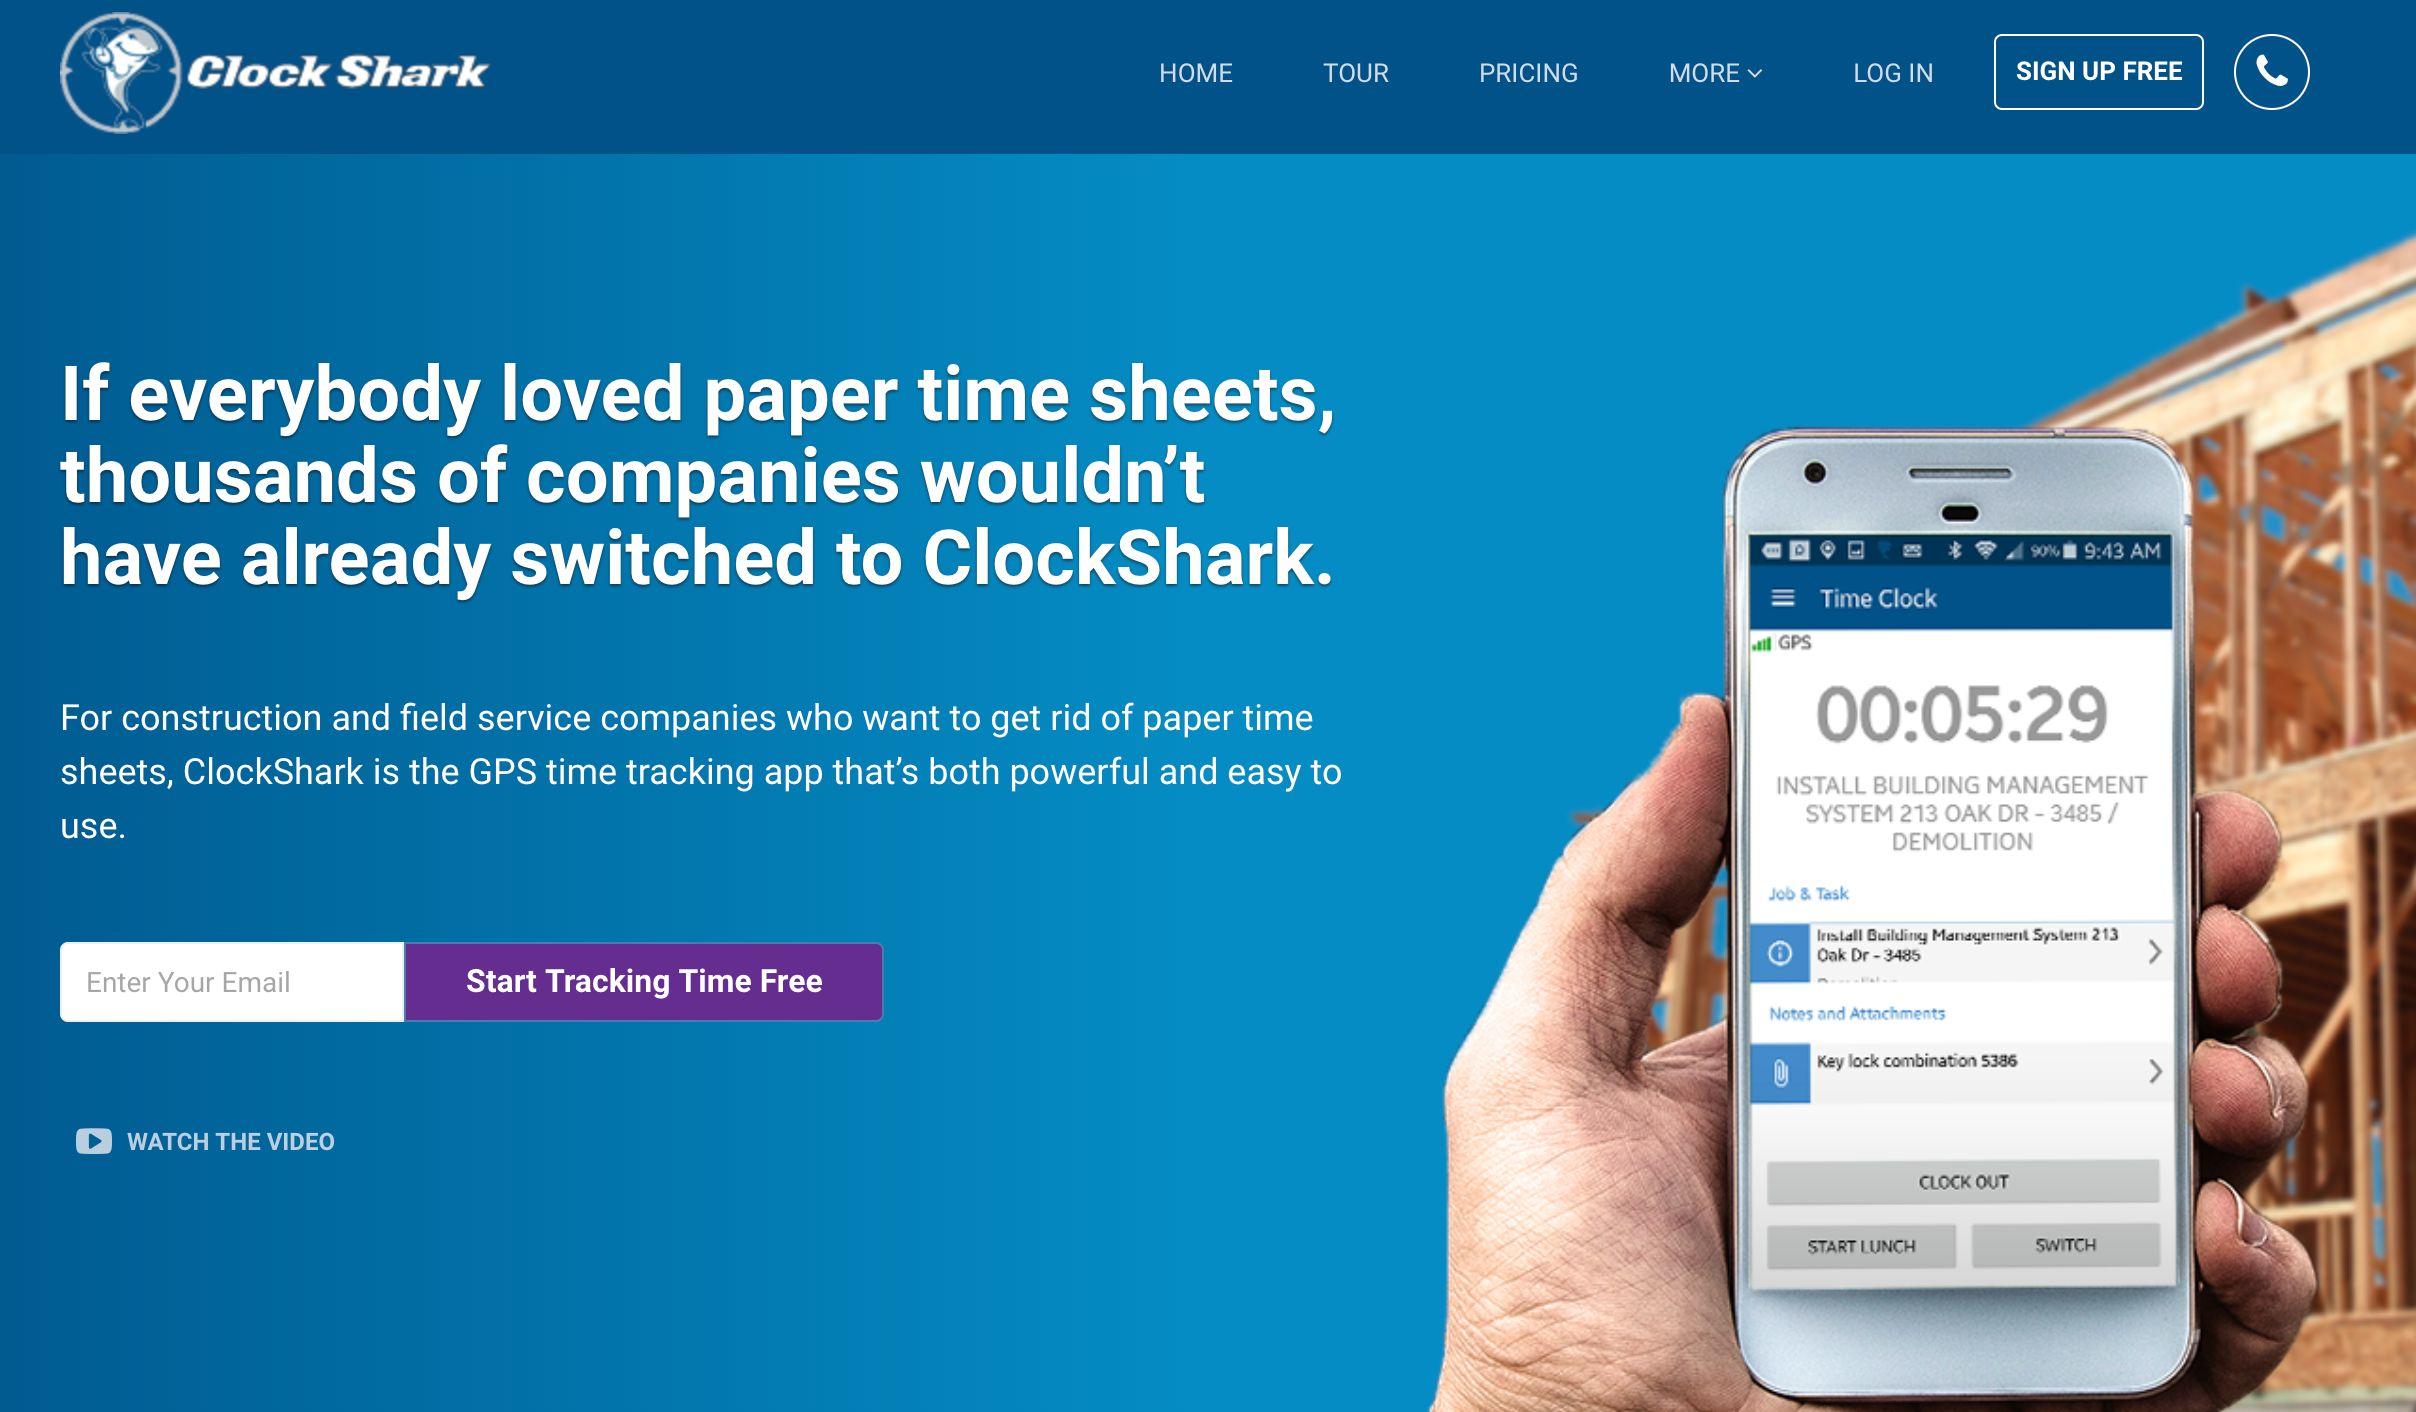 ClockShark home page